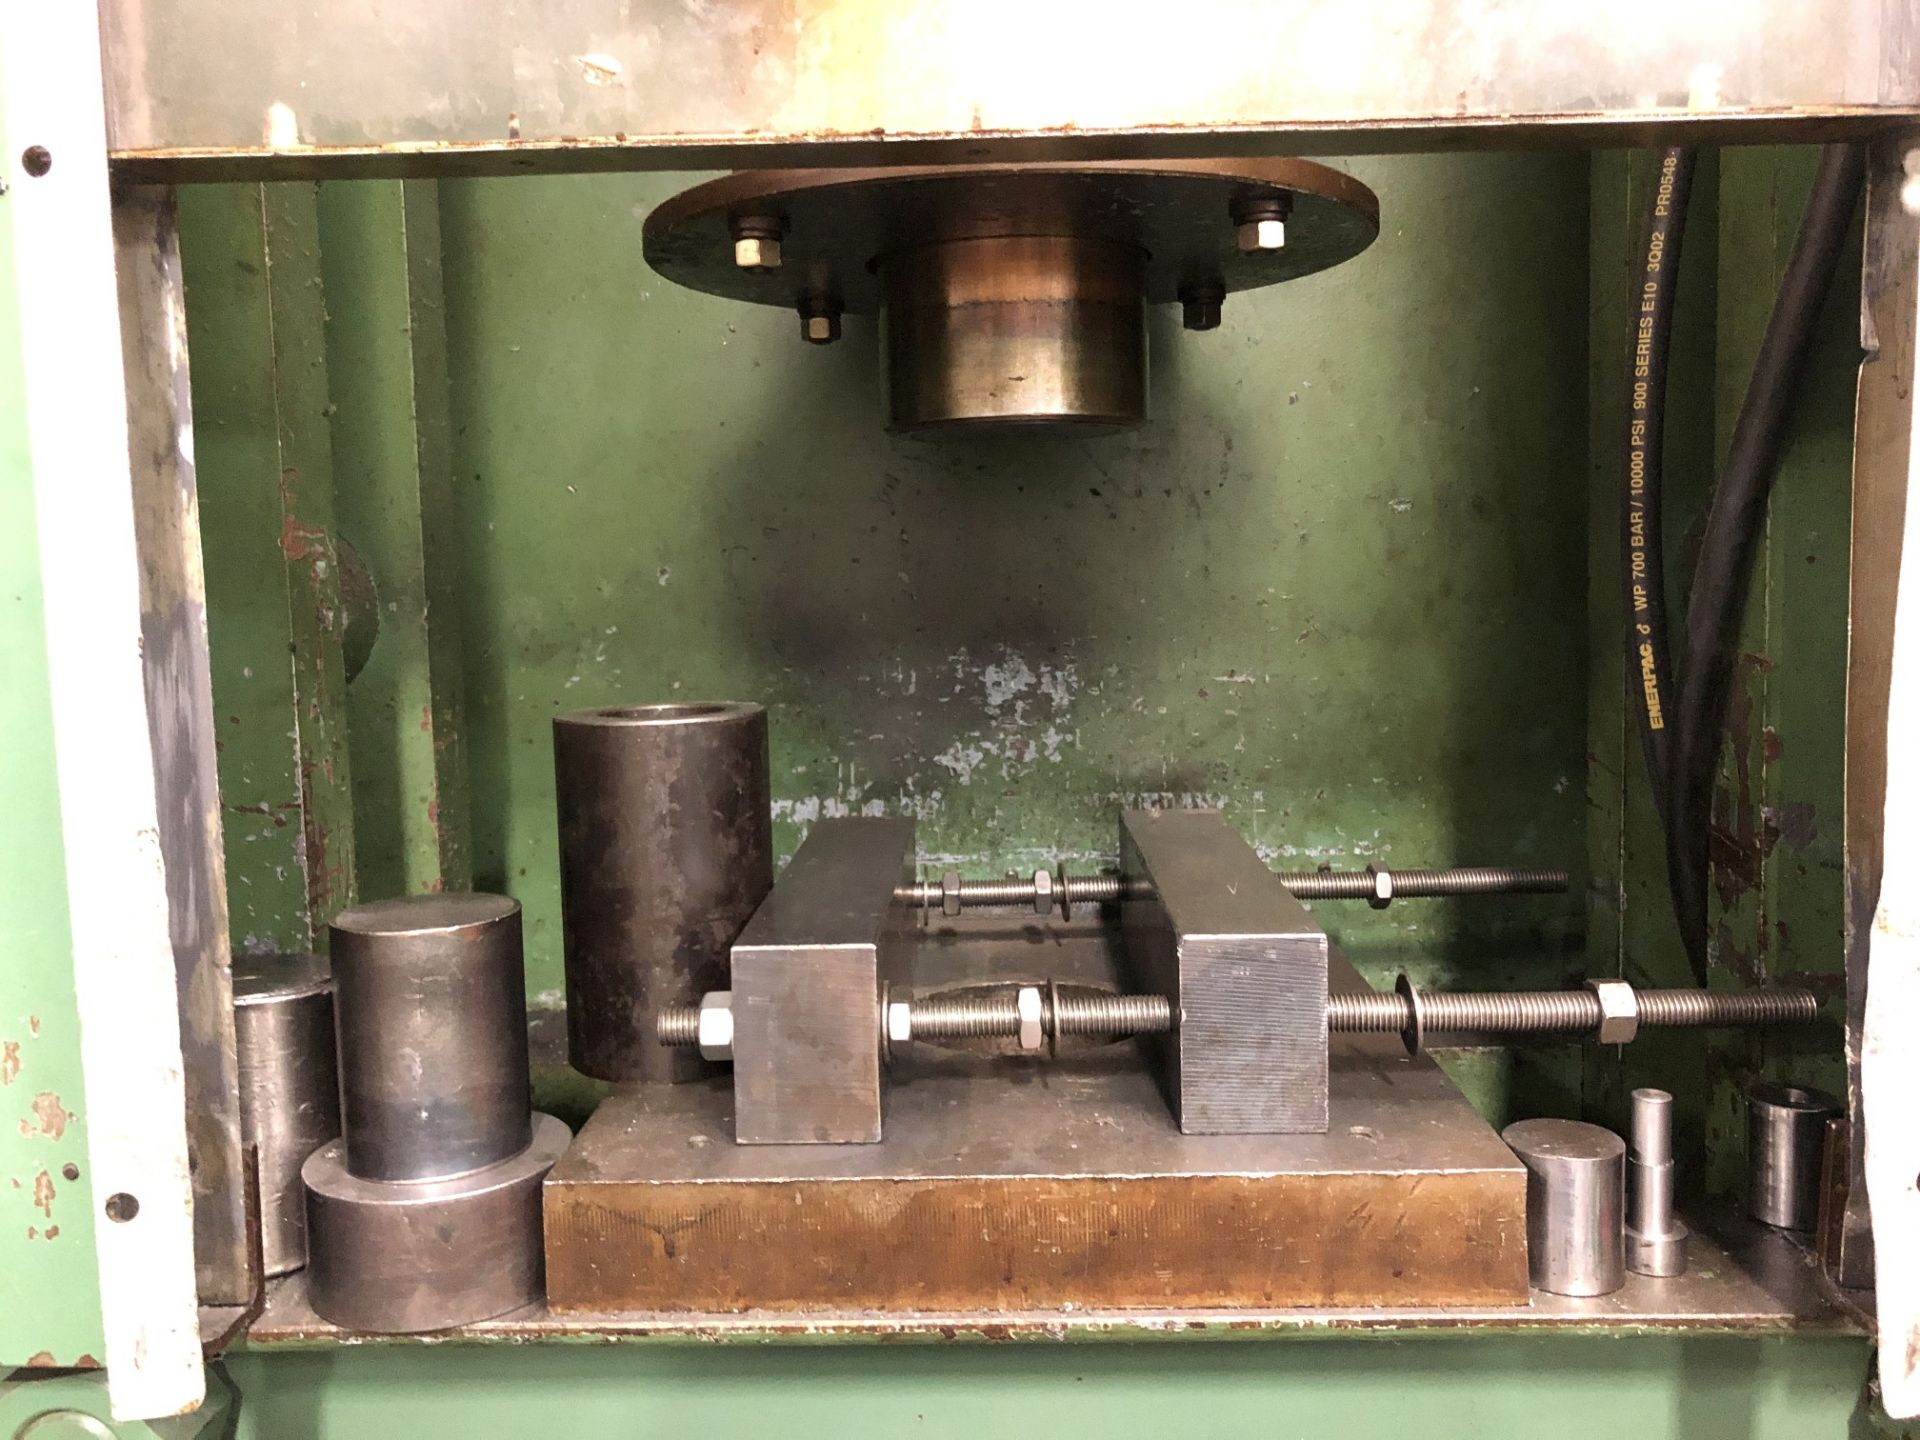 Dake 200 Ton Hydraulic Press - Image 4 of 6